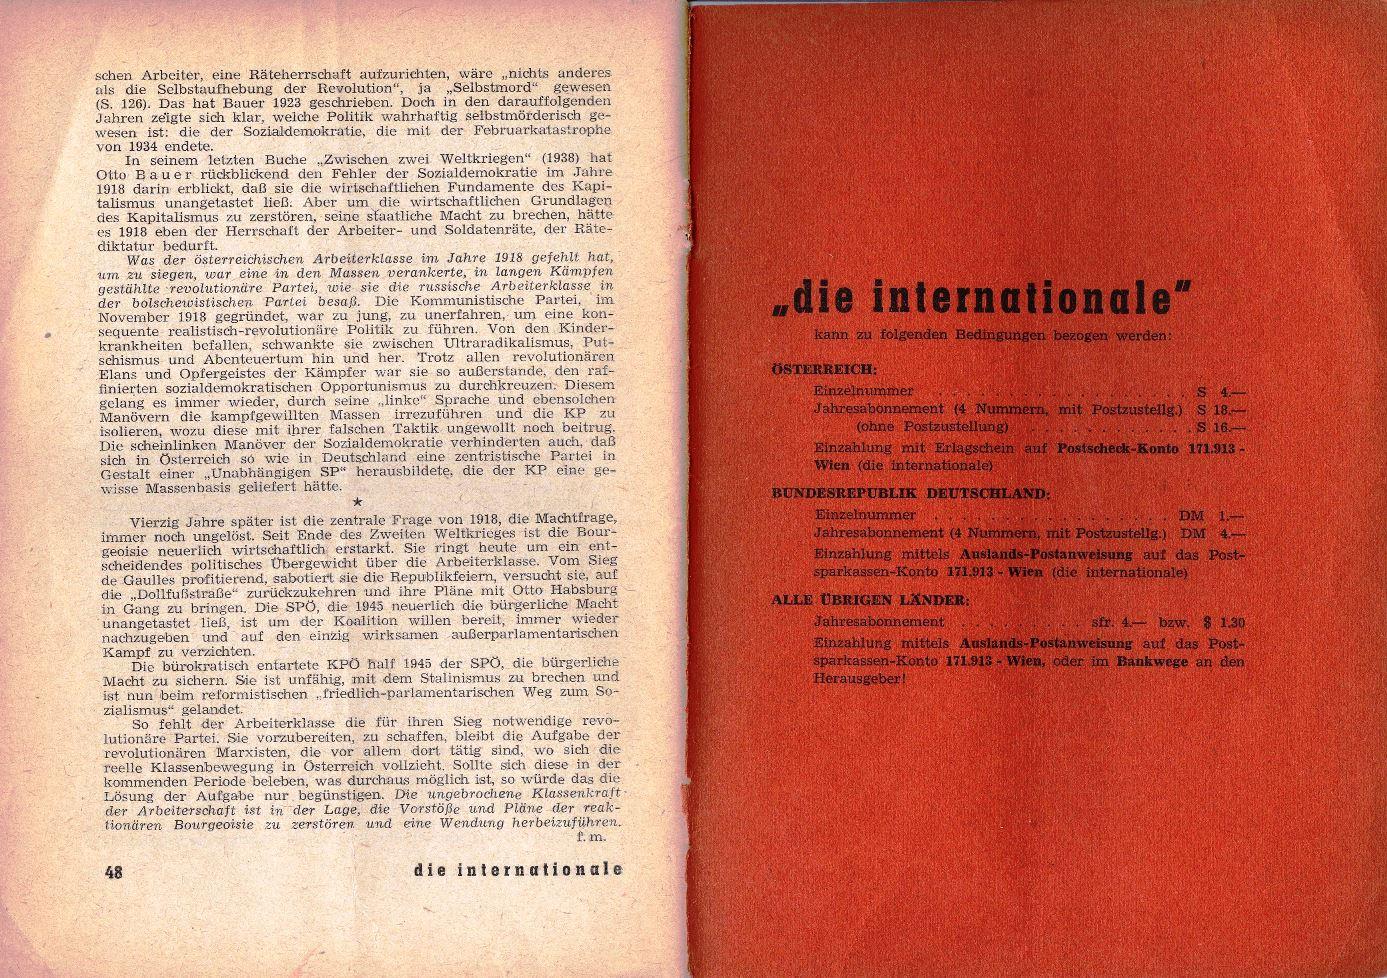 GIM_Internationale_143